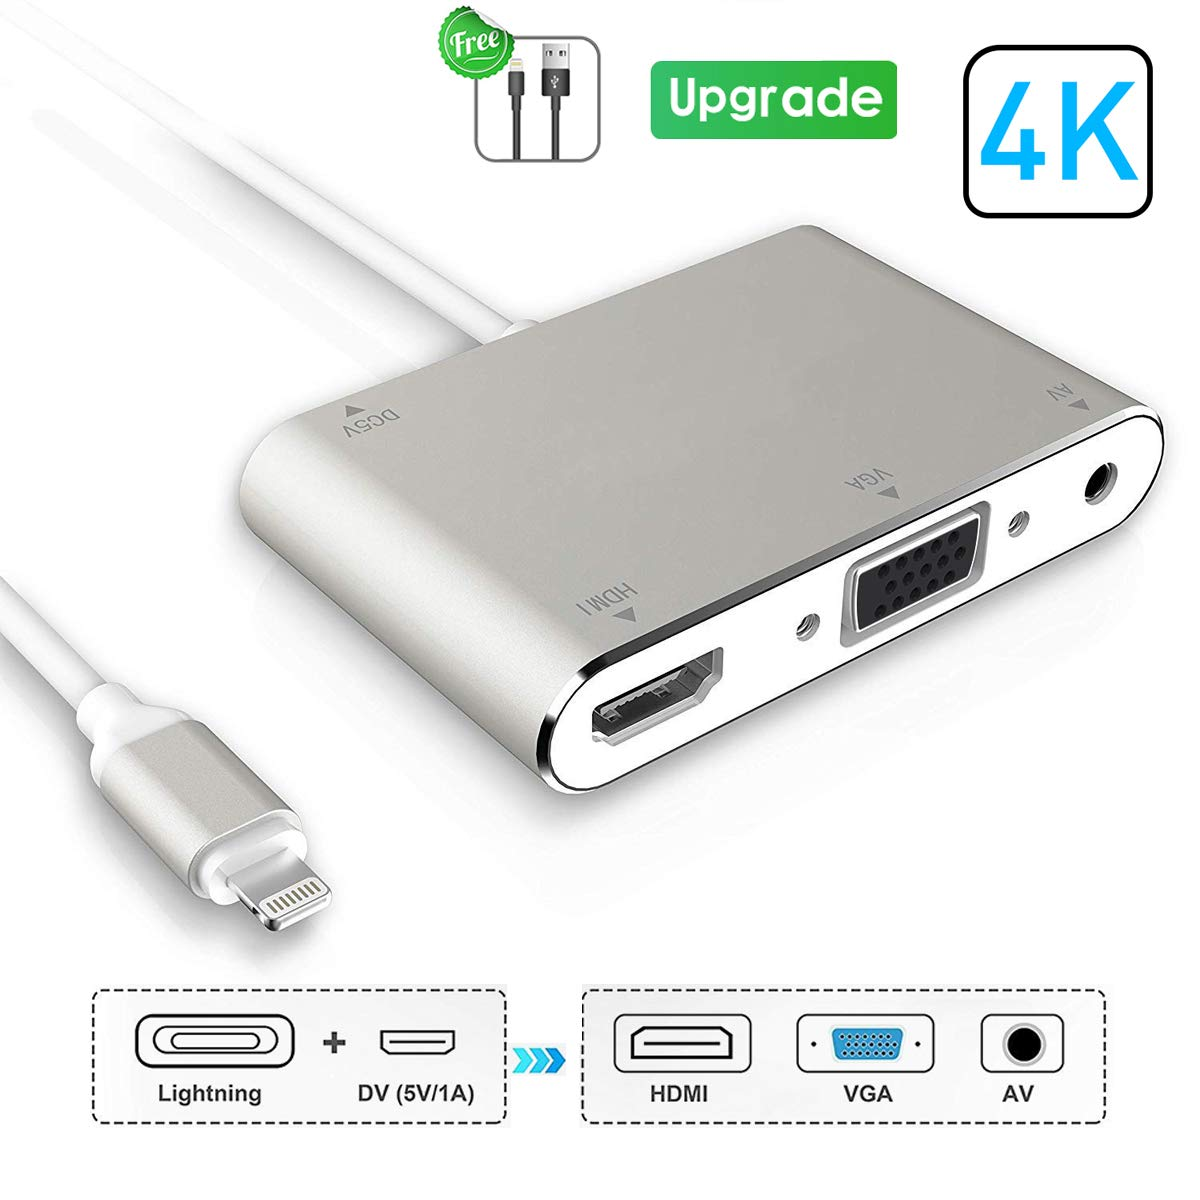 Adaptador HDMI VGA AV Plug /& Play Adaptador AV Digital Compatible con iPhone//iPad para proyector HDTV Plateado 4 en 1 Convertidor 2020